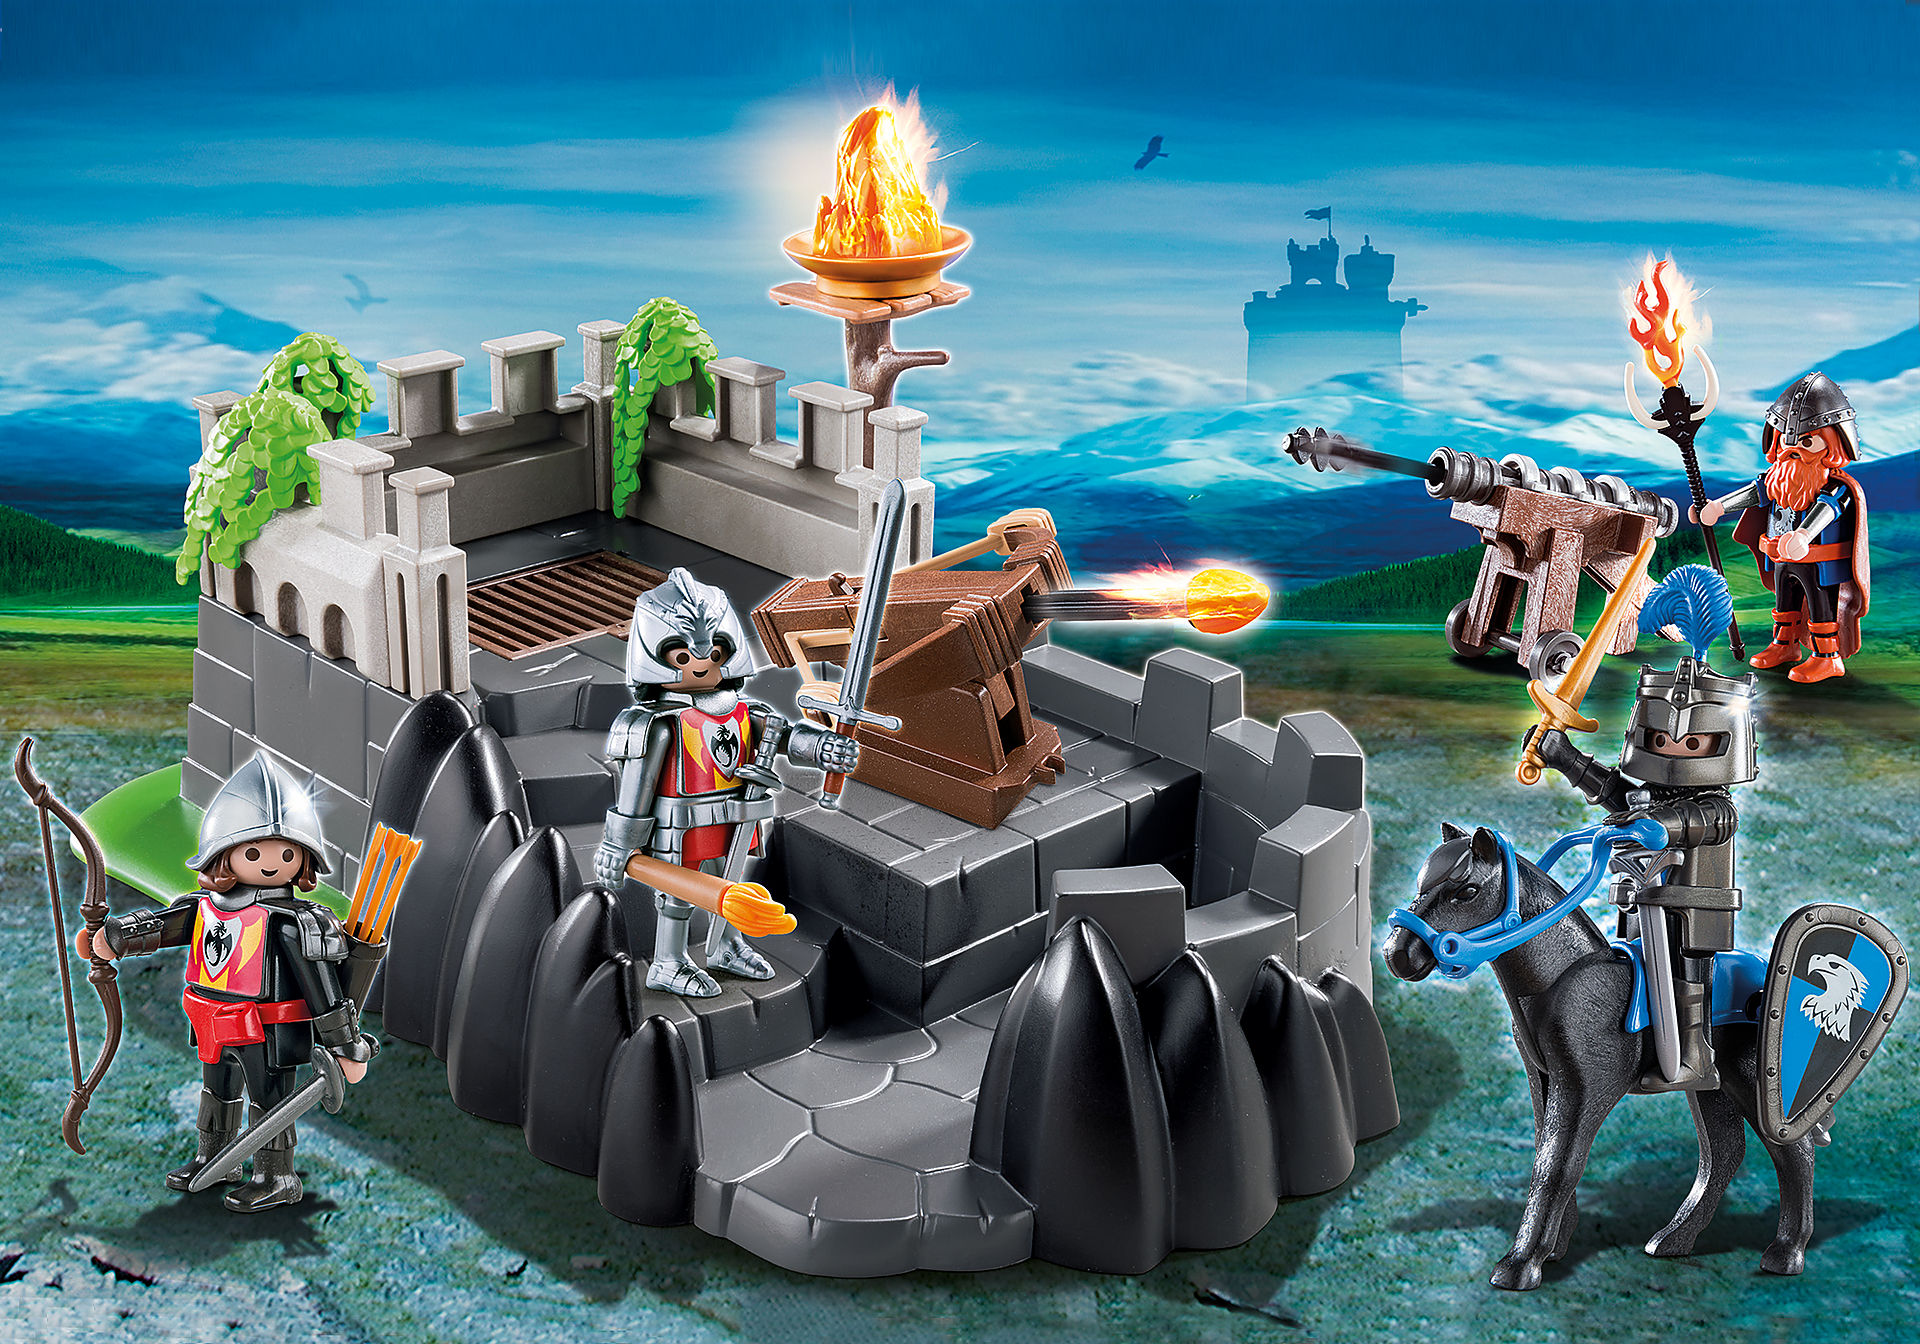 http://media.playmobil.com/i/playmobil/6627_product_detail/Bastion des chevaliers du Dragon Ailé